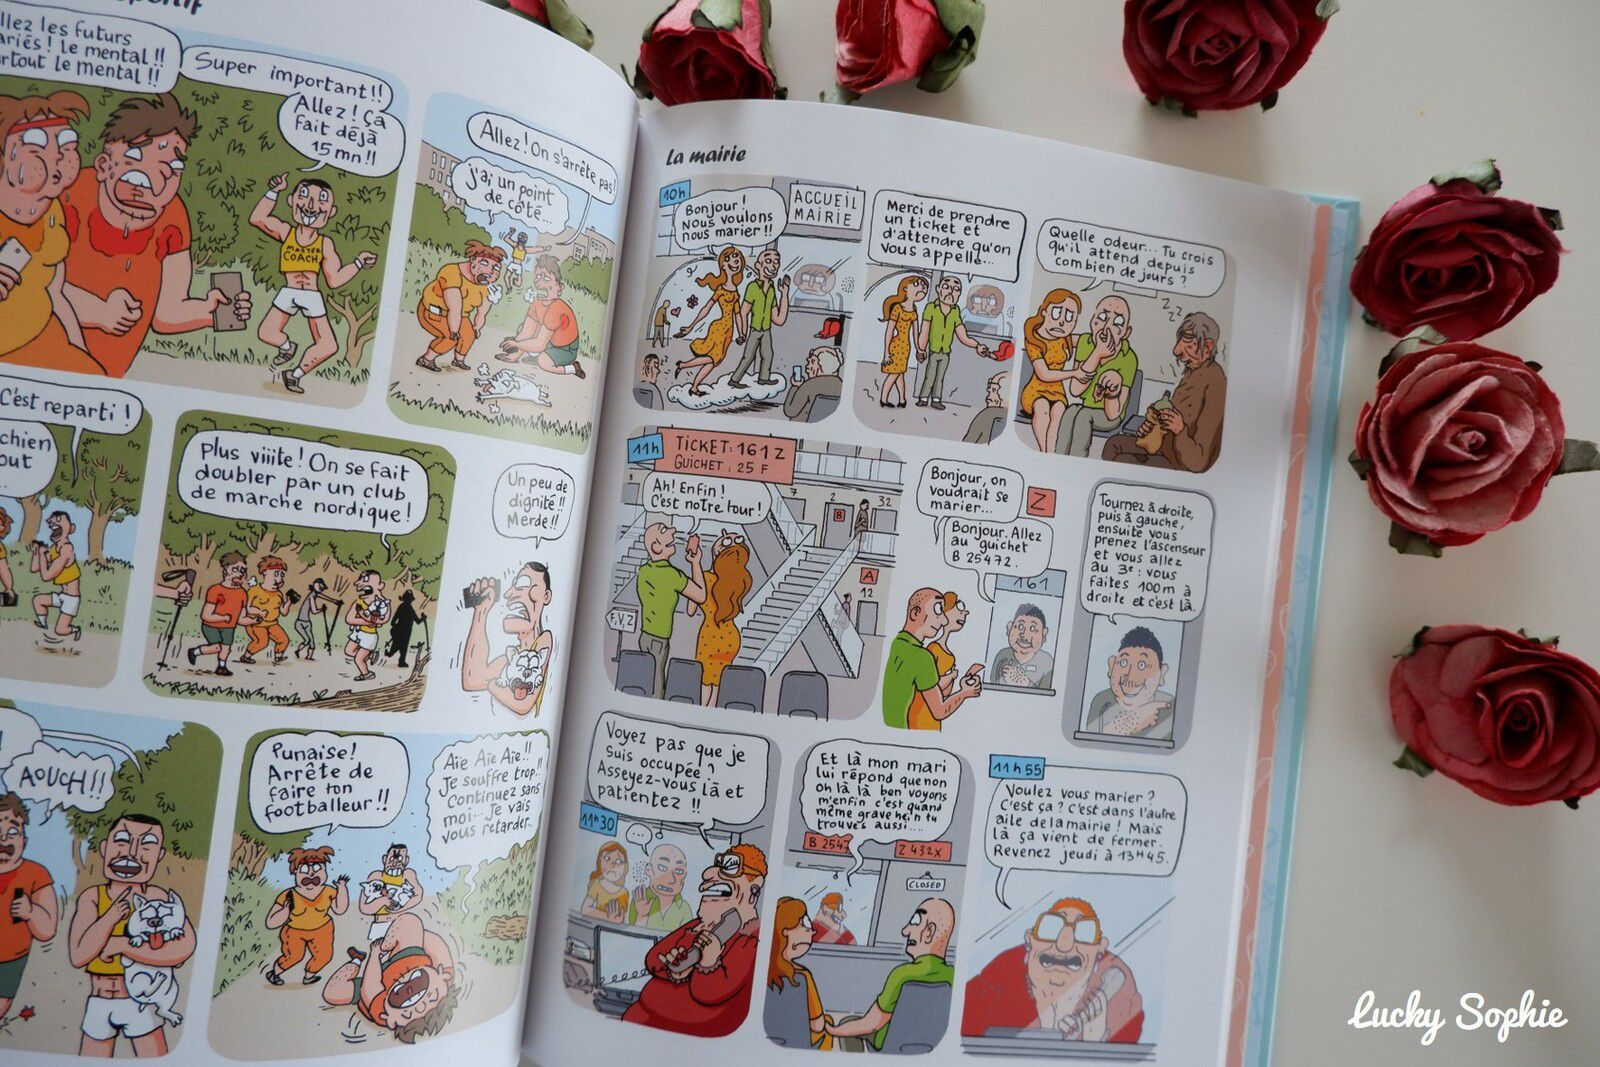 La mariée en colère, la BD hilarante !